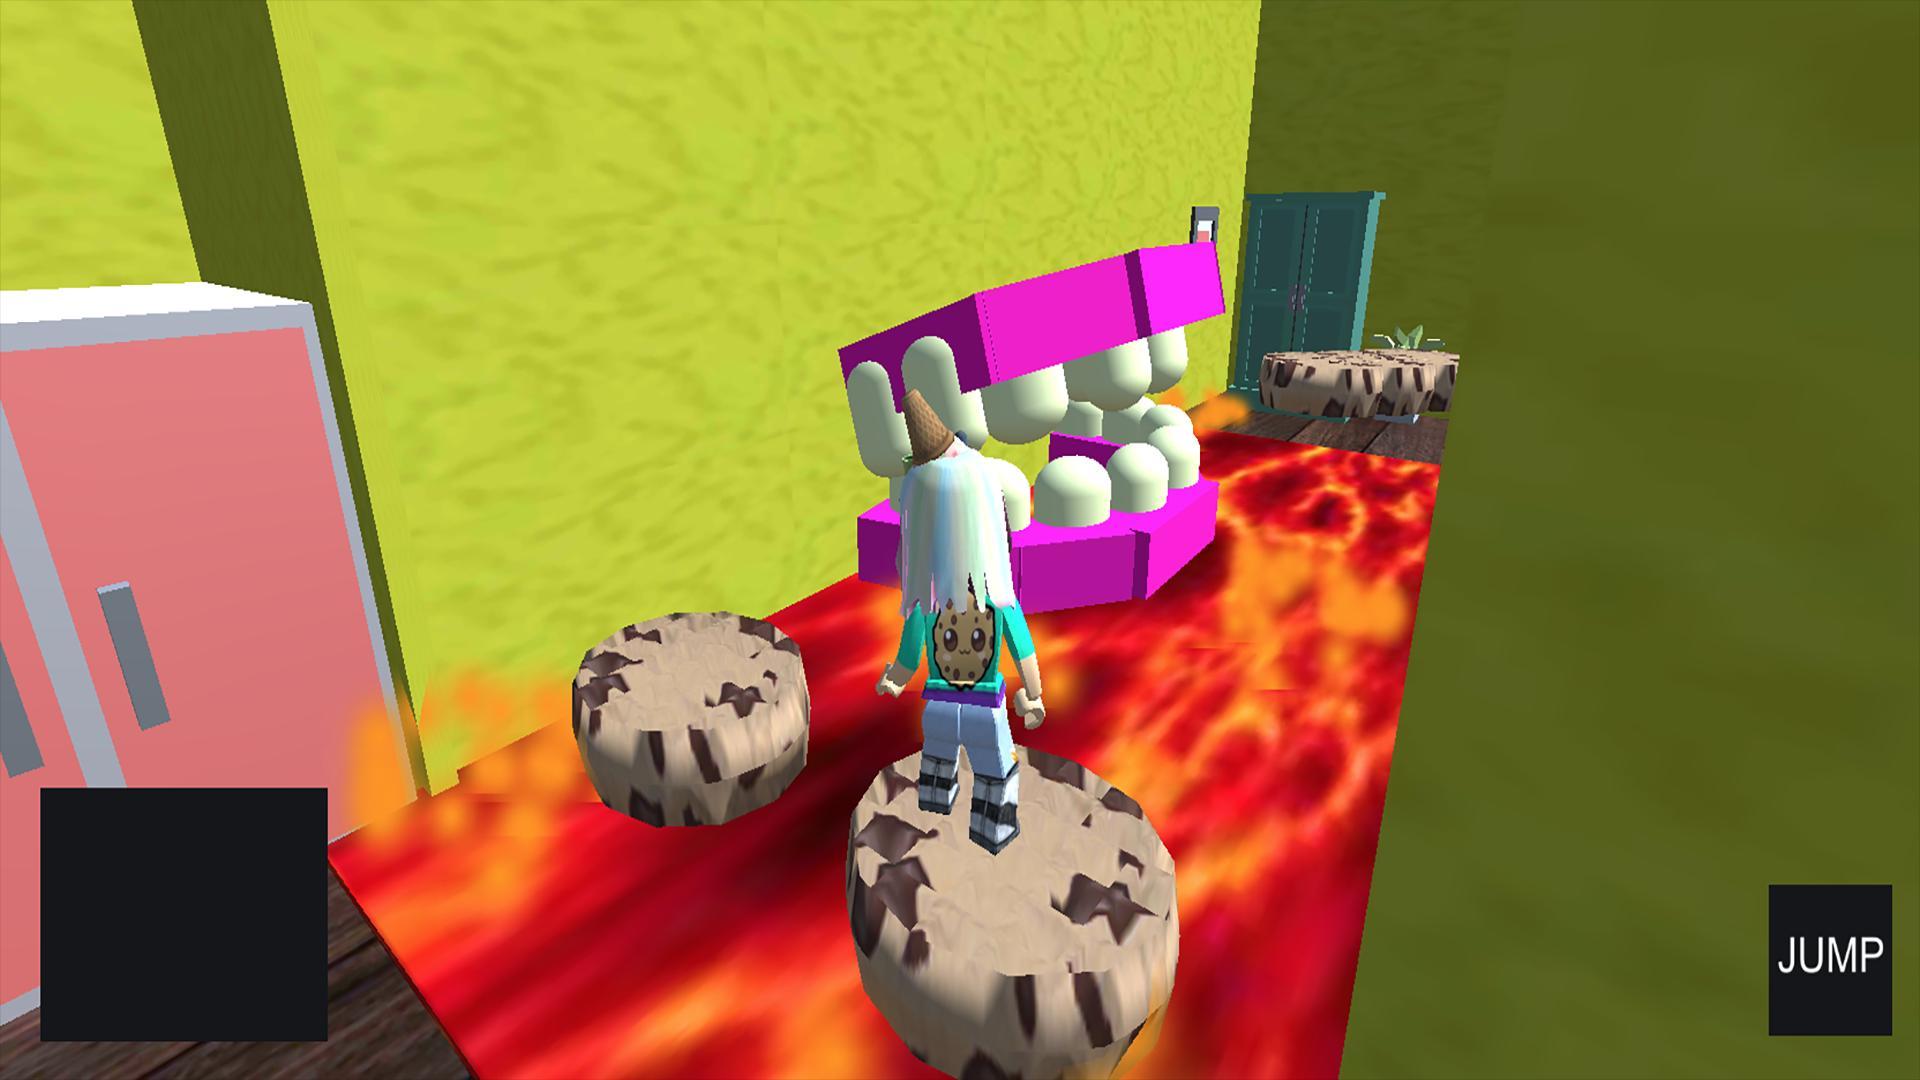 Crazy cookie swirl c robIox adventure 1.2 Screenshot 9